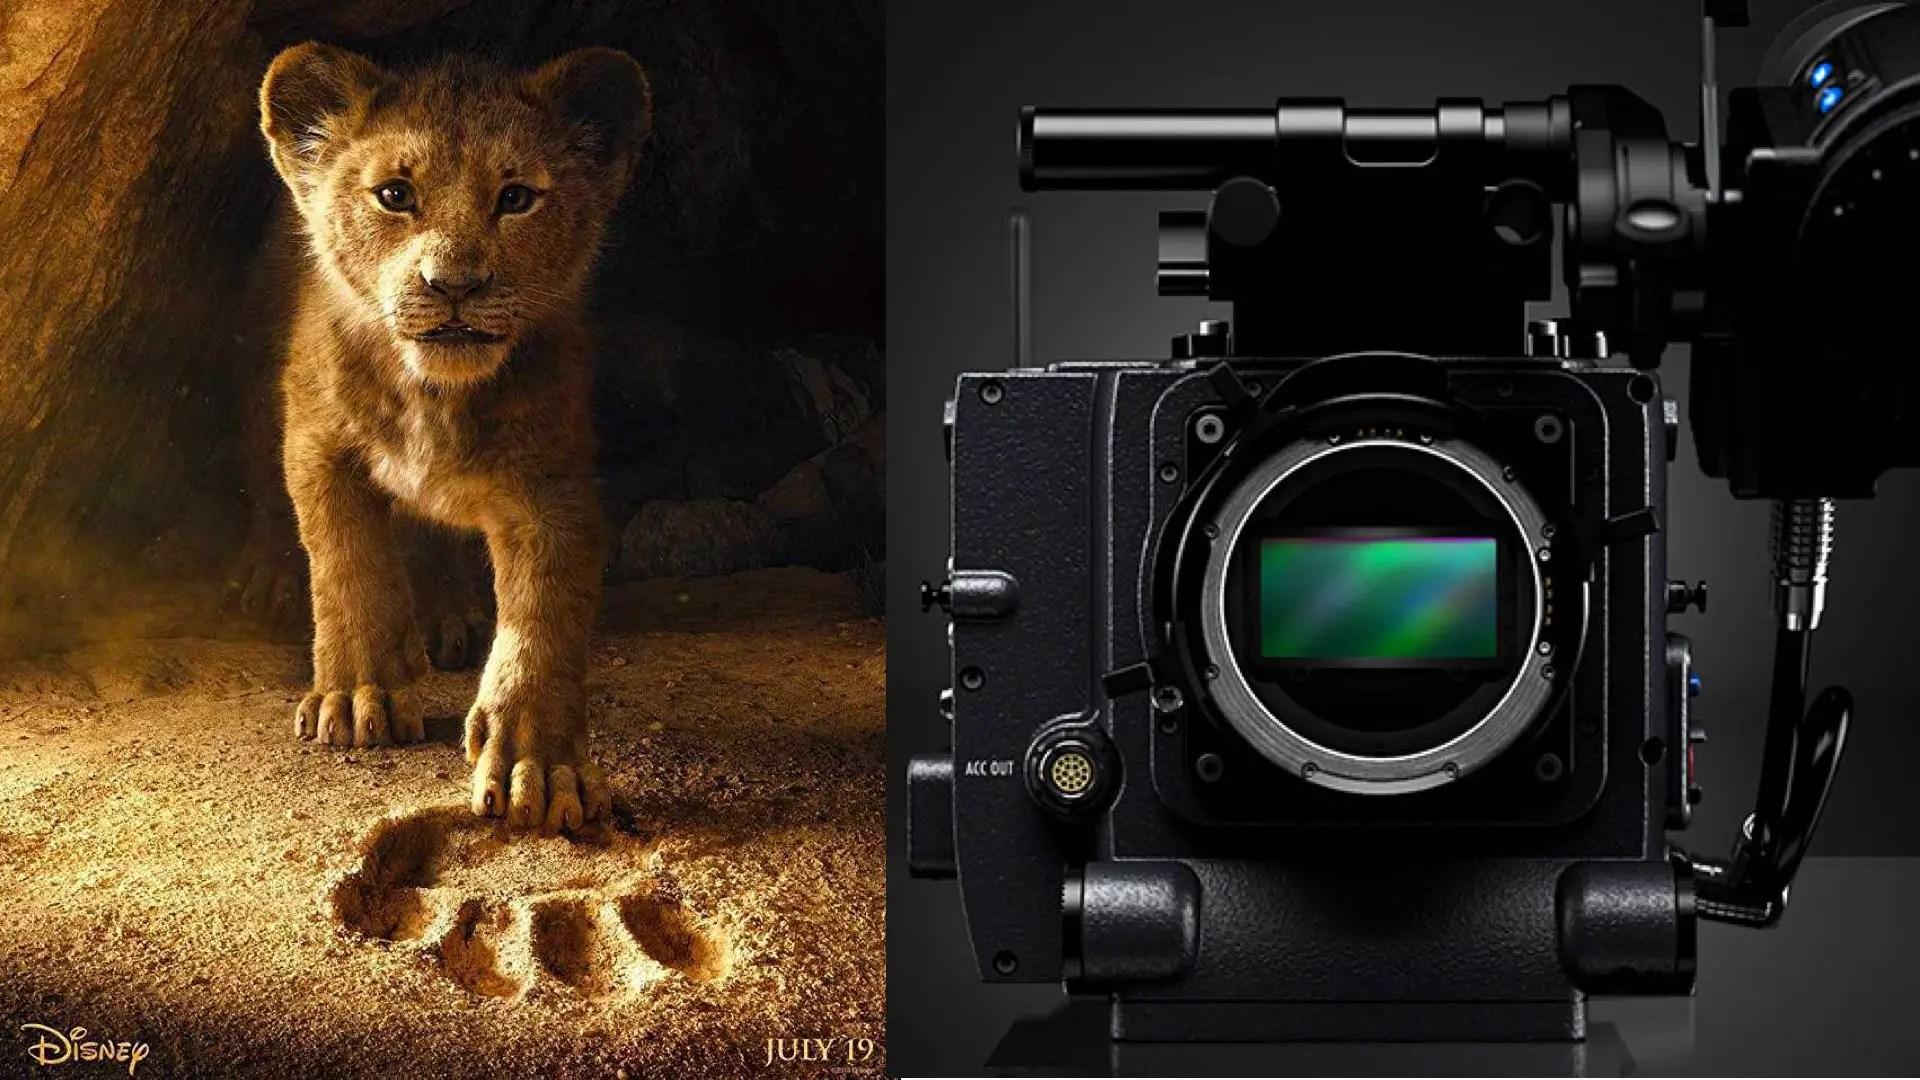 Arri Alexa 65 The Camera Behind The Lion King 2019 Y M Cinema